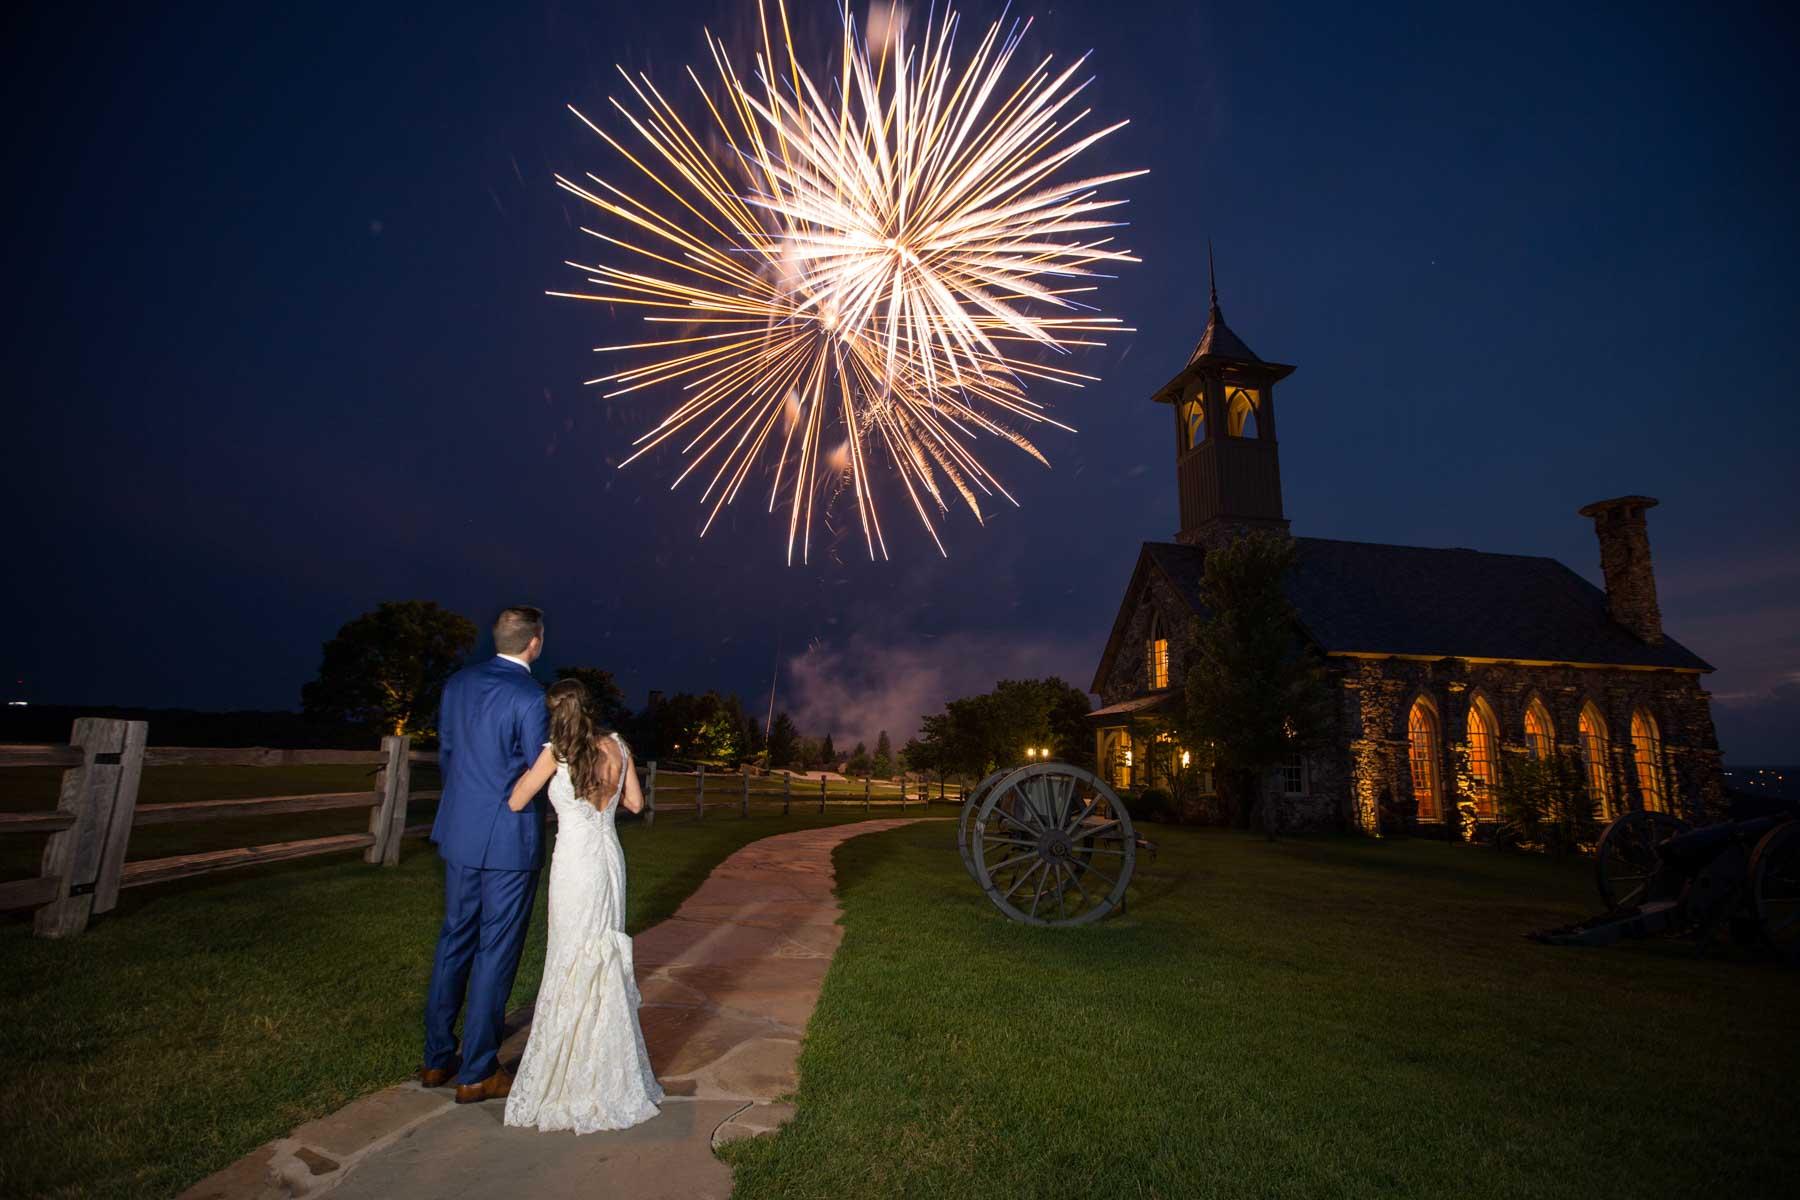 wedding fireworks-1.jpg